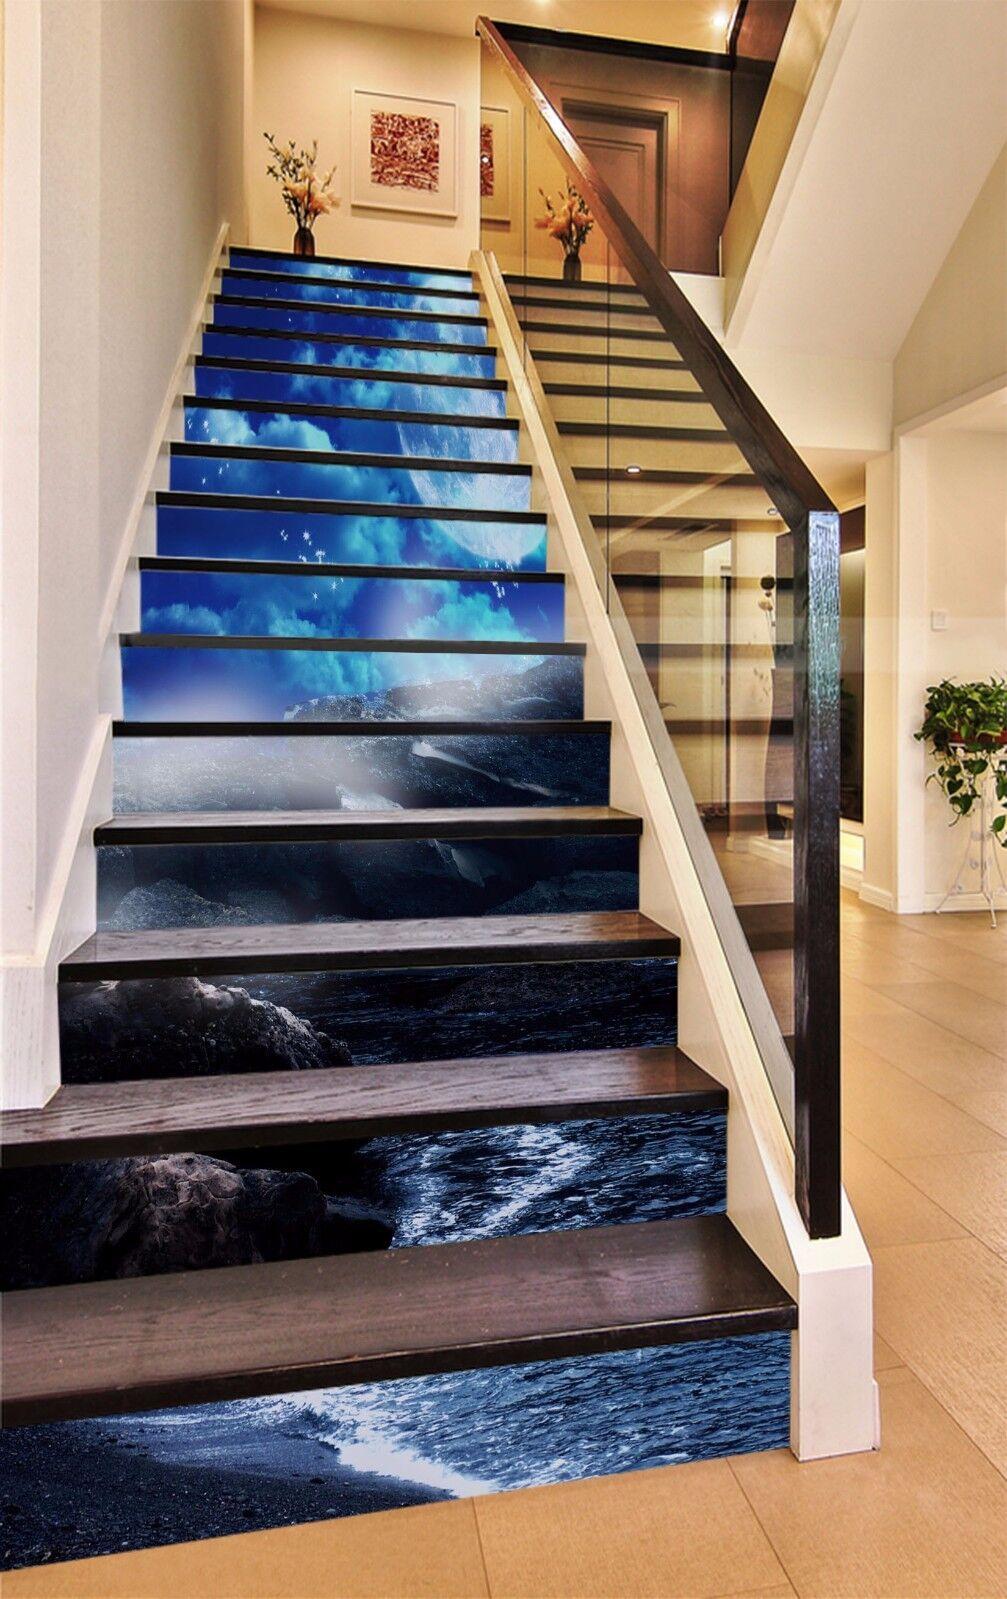 3D Coast Full Moon Stair Risers Decoration Photo Mural Vinyl Decal WandPapier AU